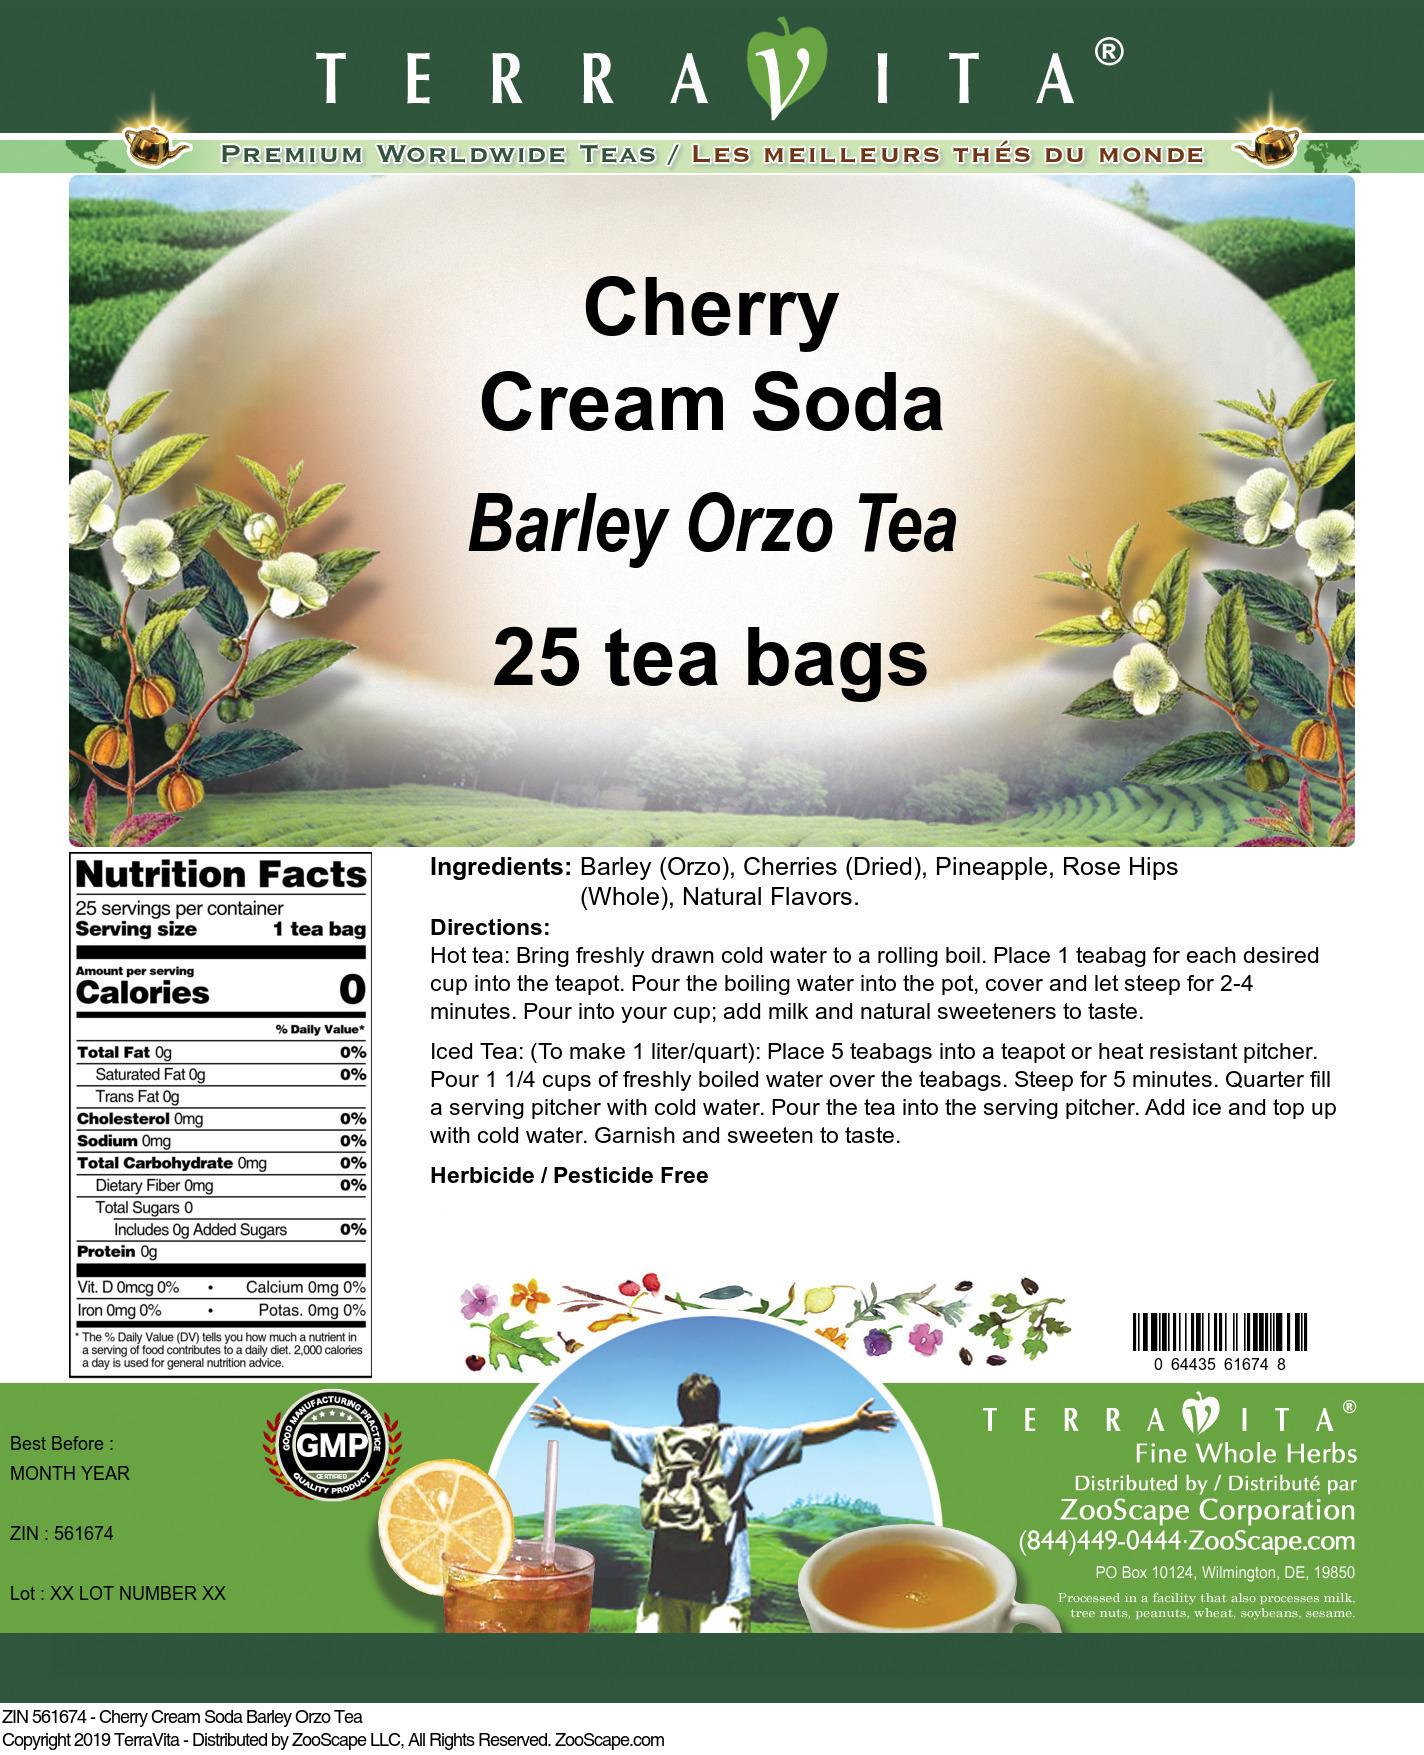 Cherry Cream Soda Barley Orzo Tea